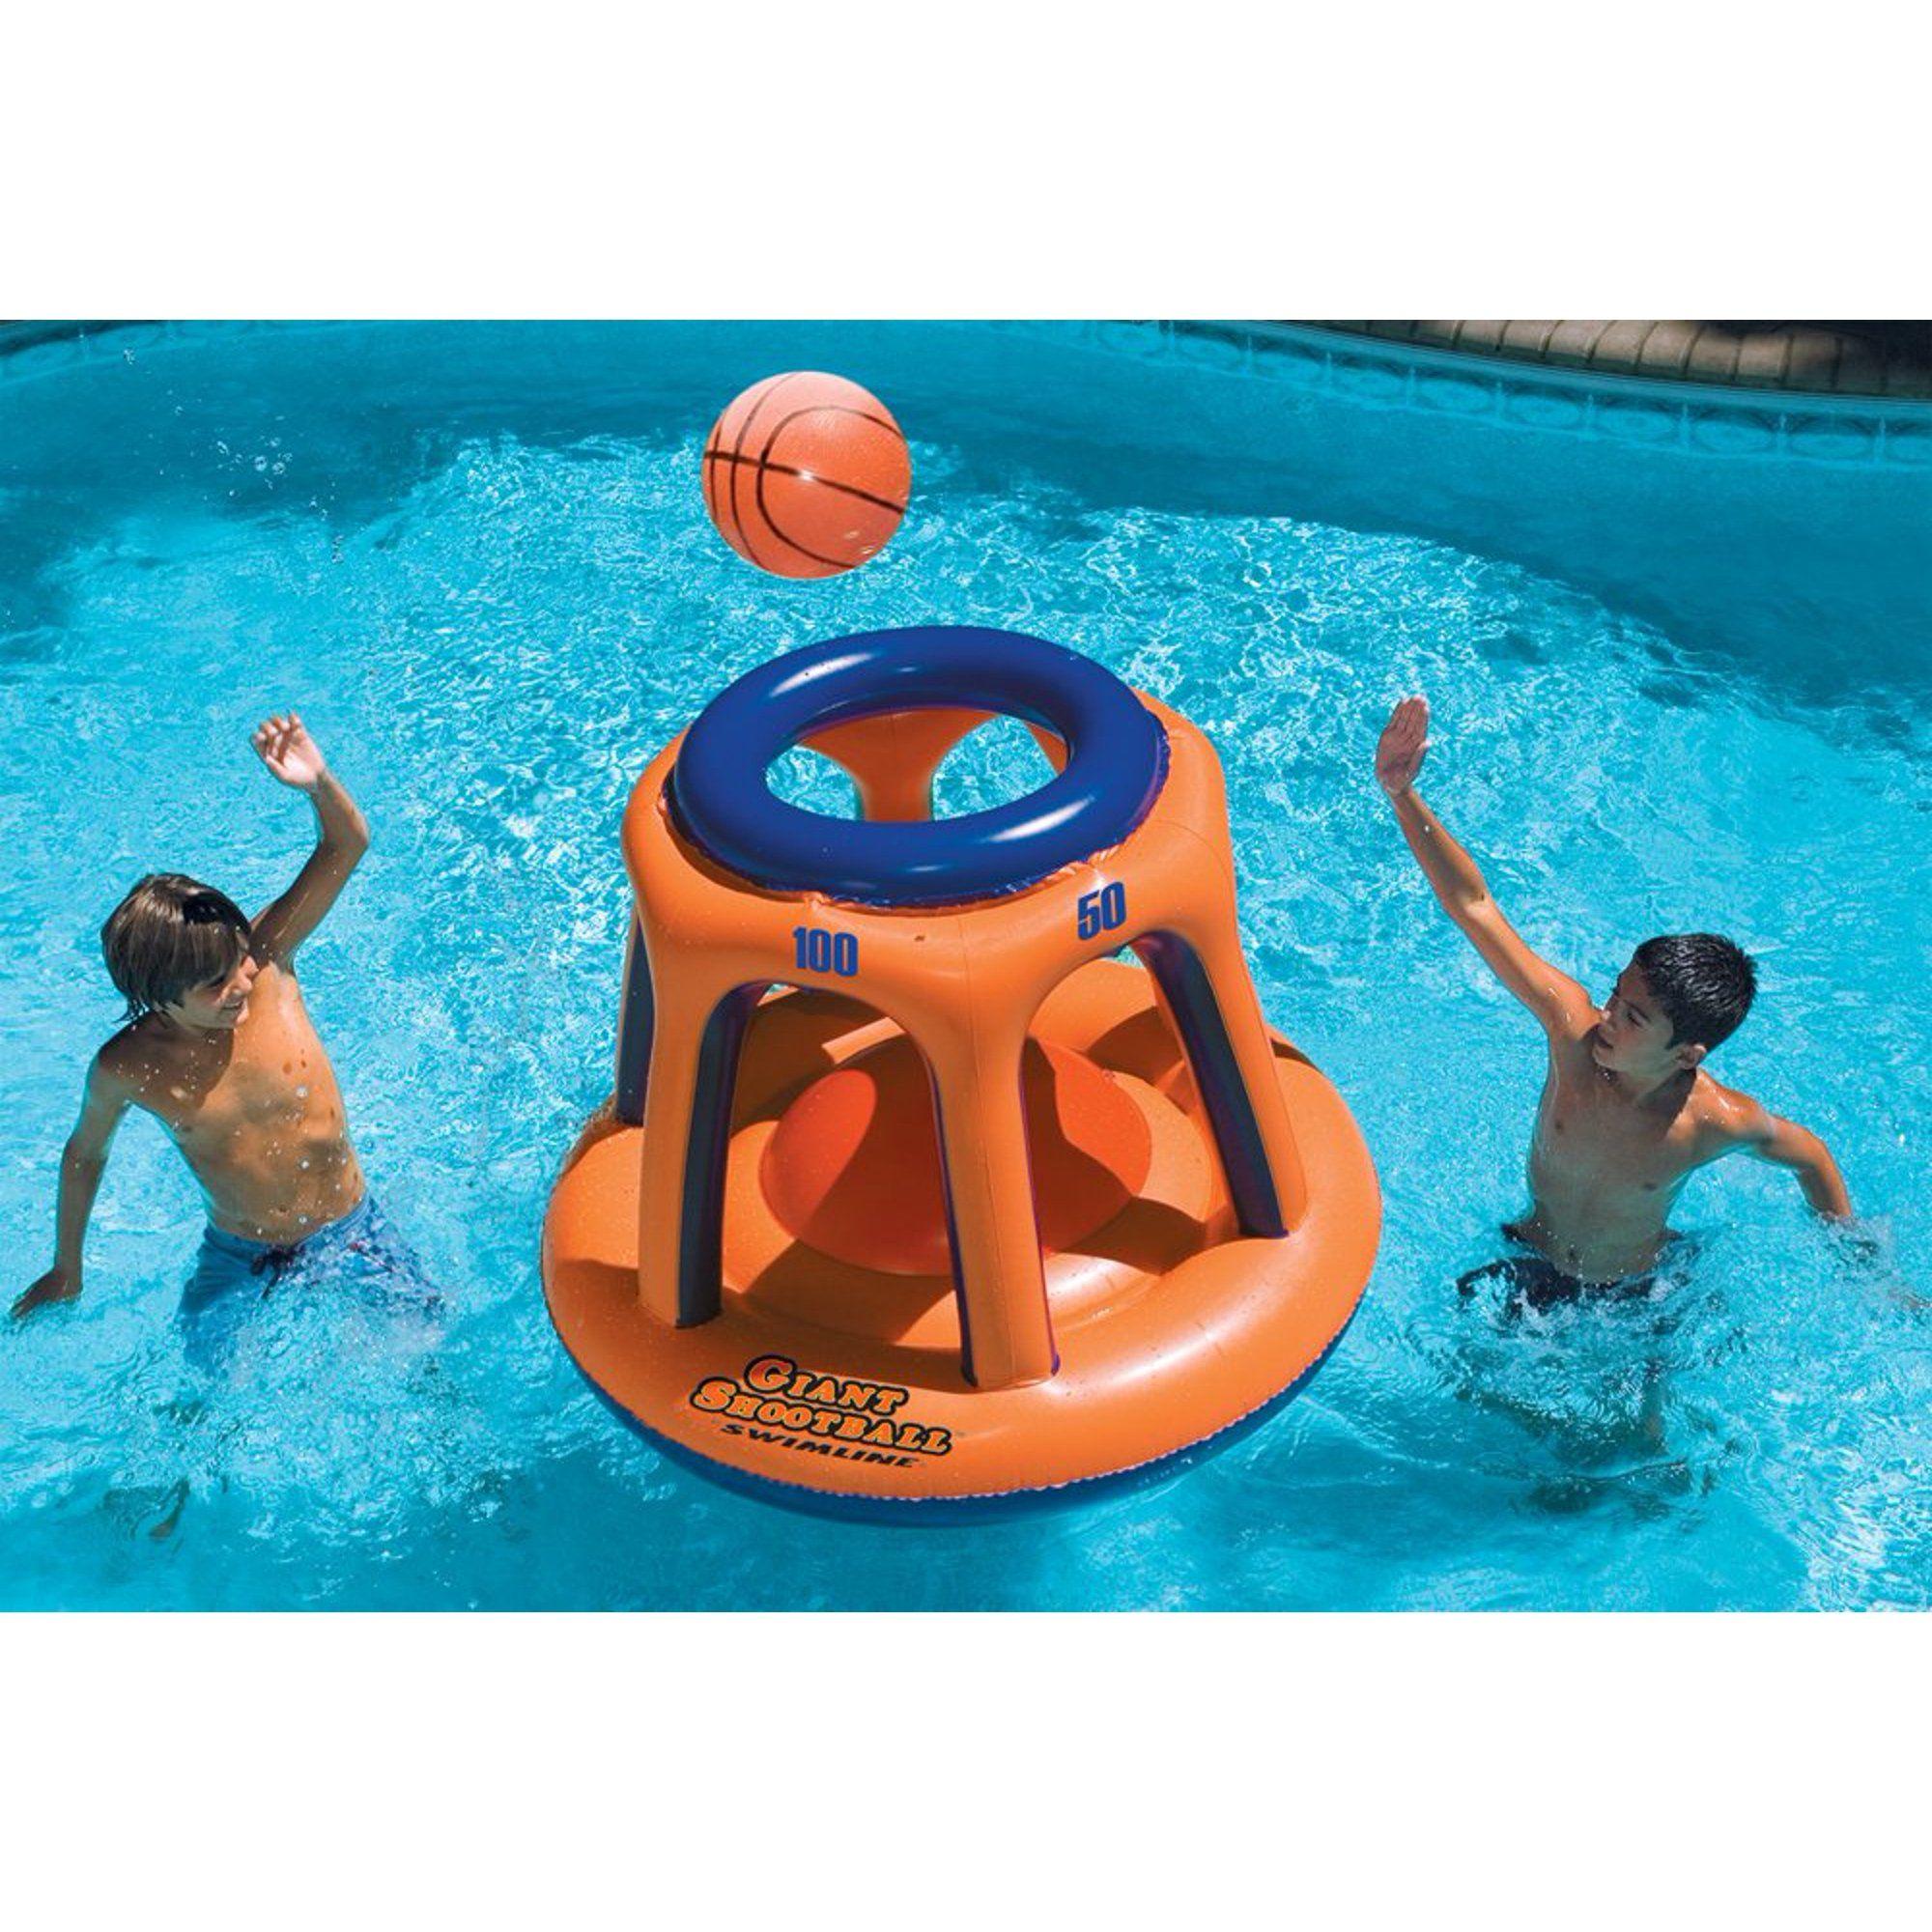 Swimline 90285 Basketball Hoop Giant Shootball Inflatable Fun Swimming Pool Toy Walmart Com In 2020 Swimming Pool Toys Pool Toys Inflatable Pool Toys